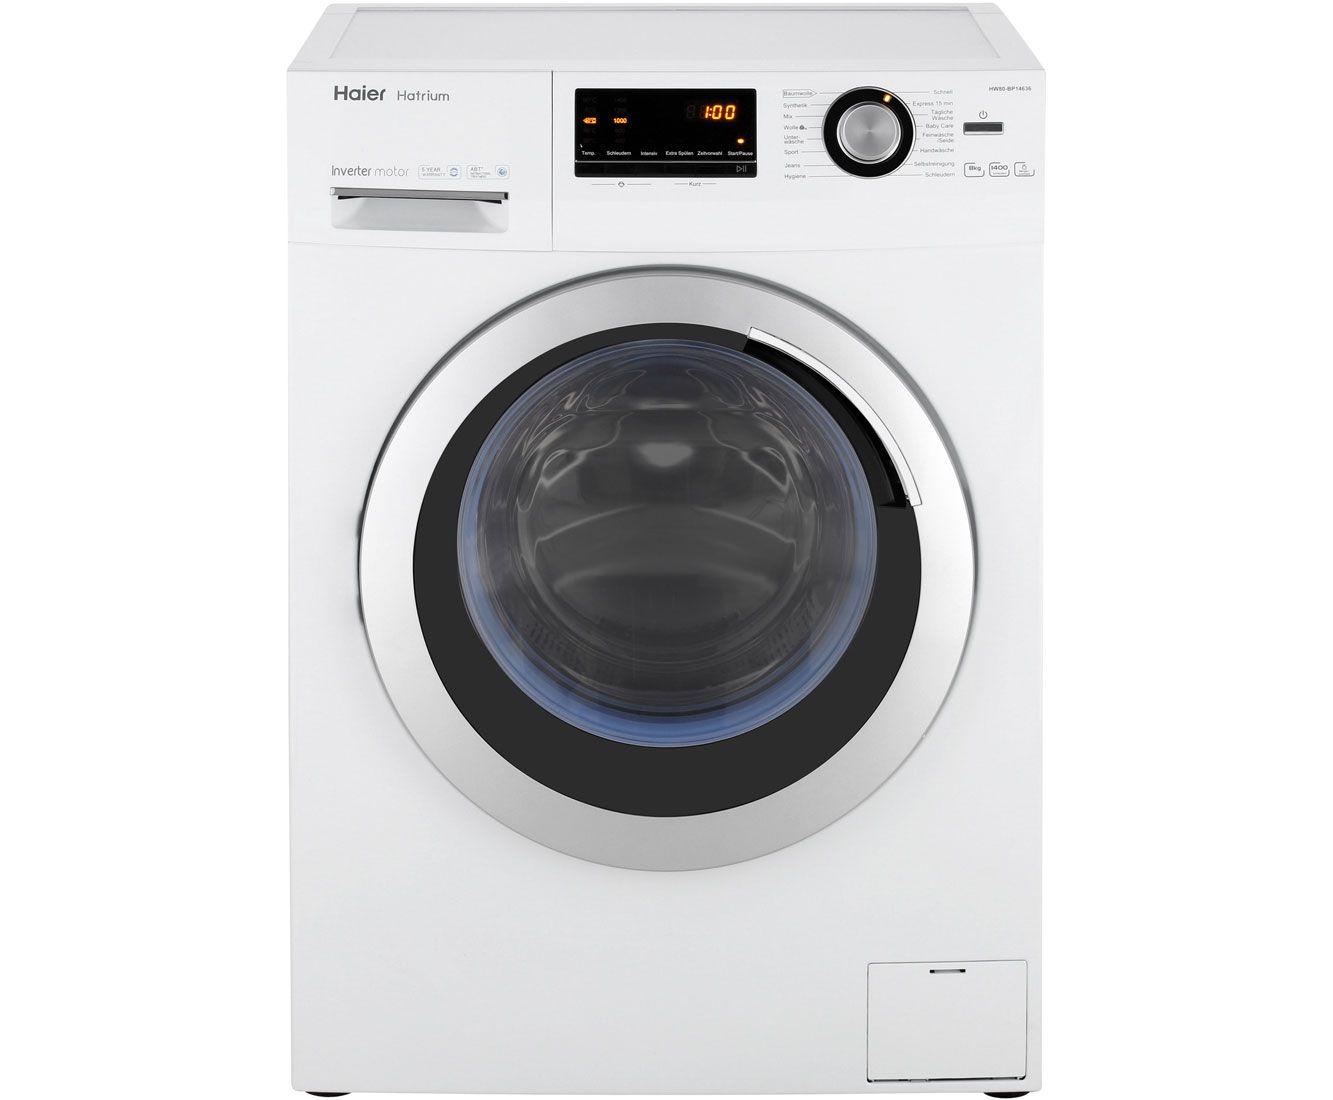 Waschmaschine Haier HW 80-BP14636 (A+++, 8kg, 1400 U/min, 16 Programme, Mengenautomatik, AquaStop) für 299€ durch 100€-Direktabzug